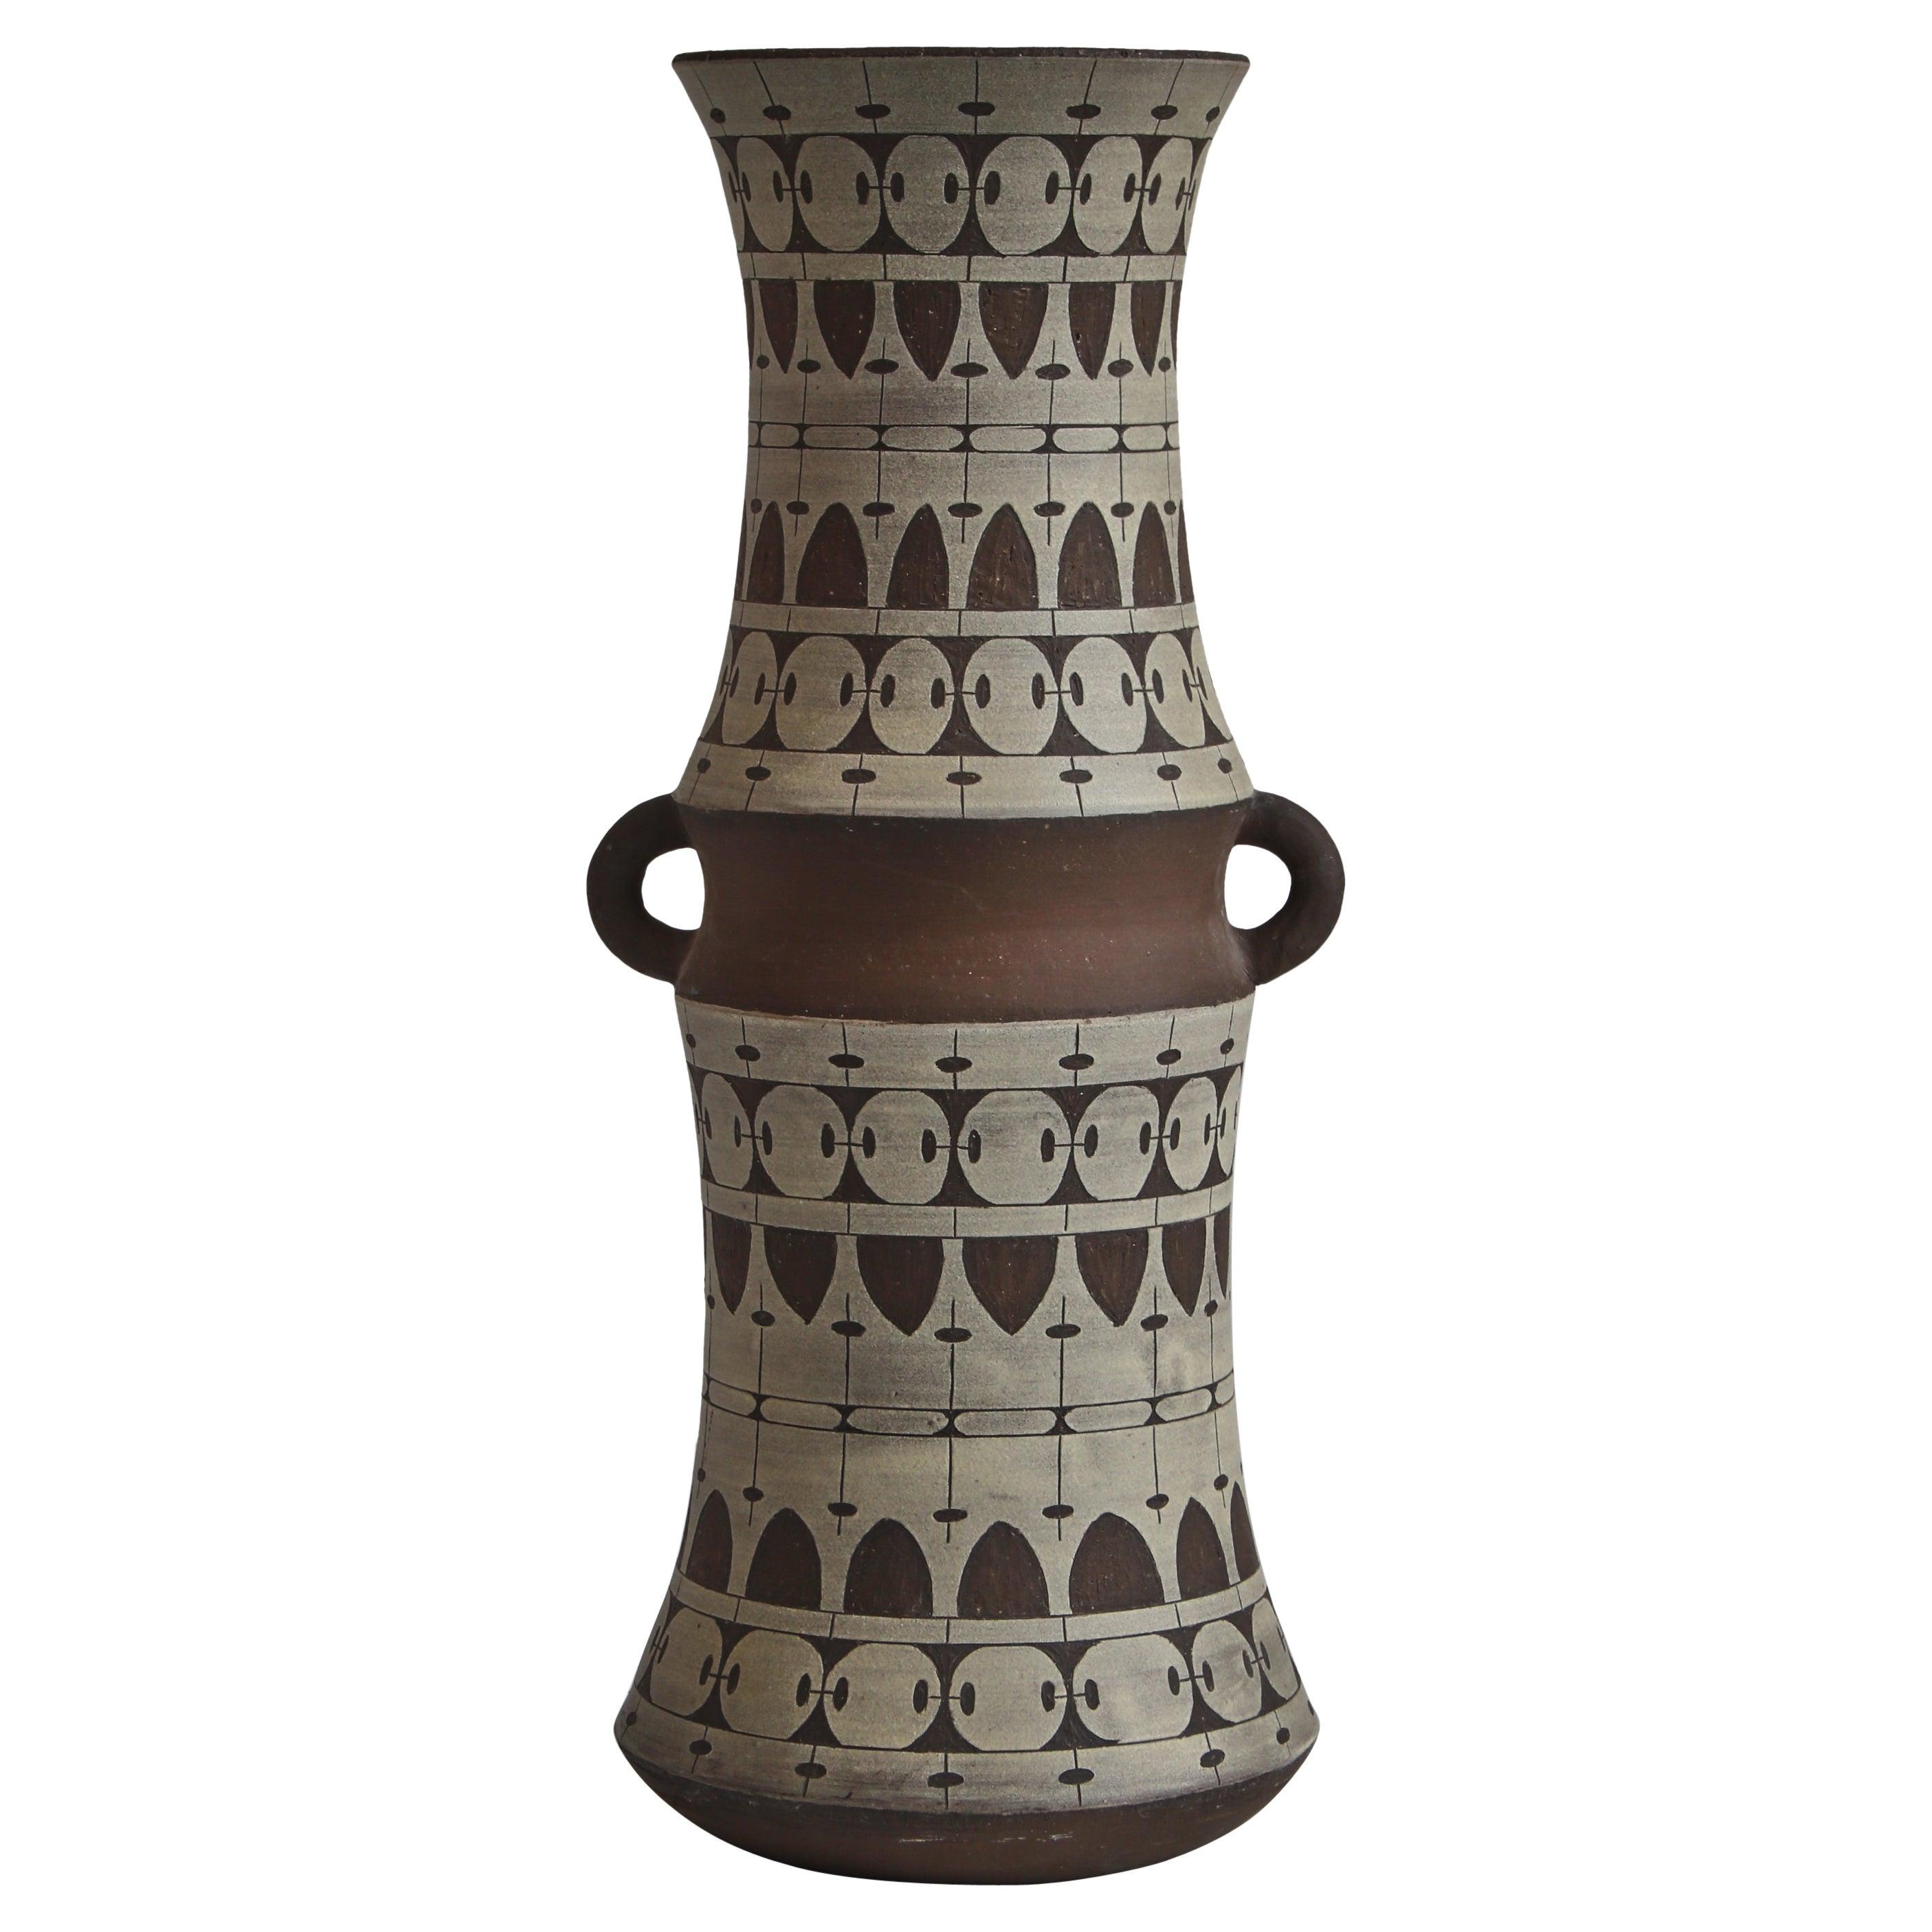 Large Scandinavian Modern Ceramic Floor Vase by Ulla Winblad, Sweden, 1960s